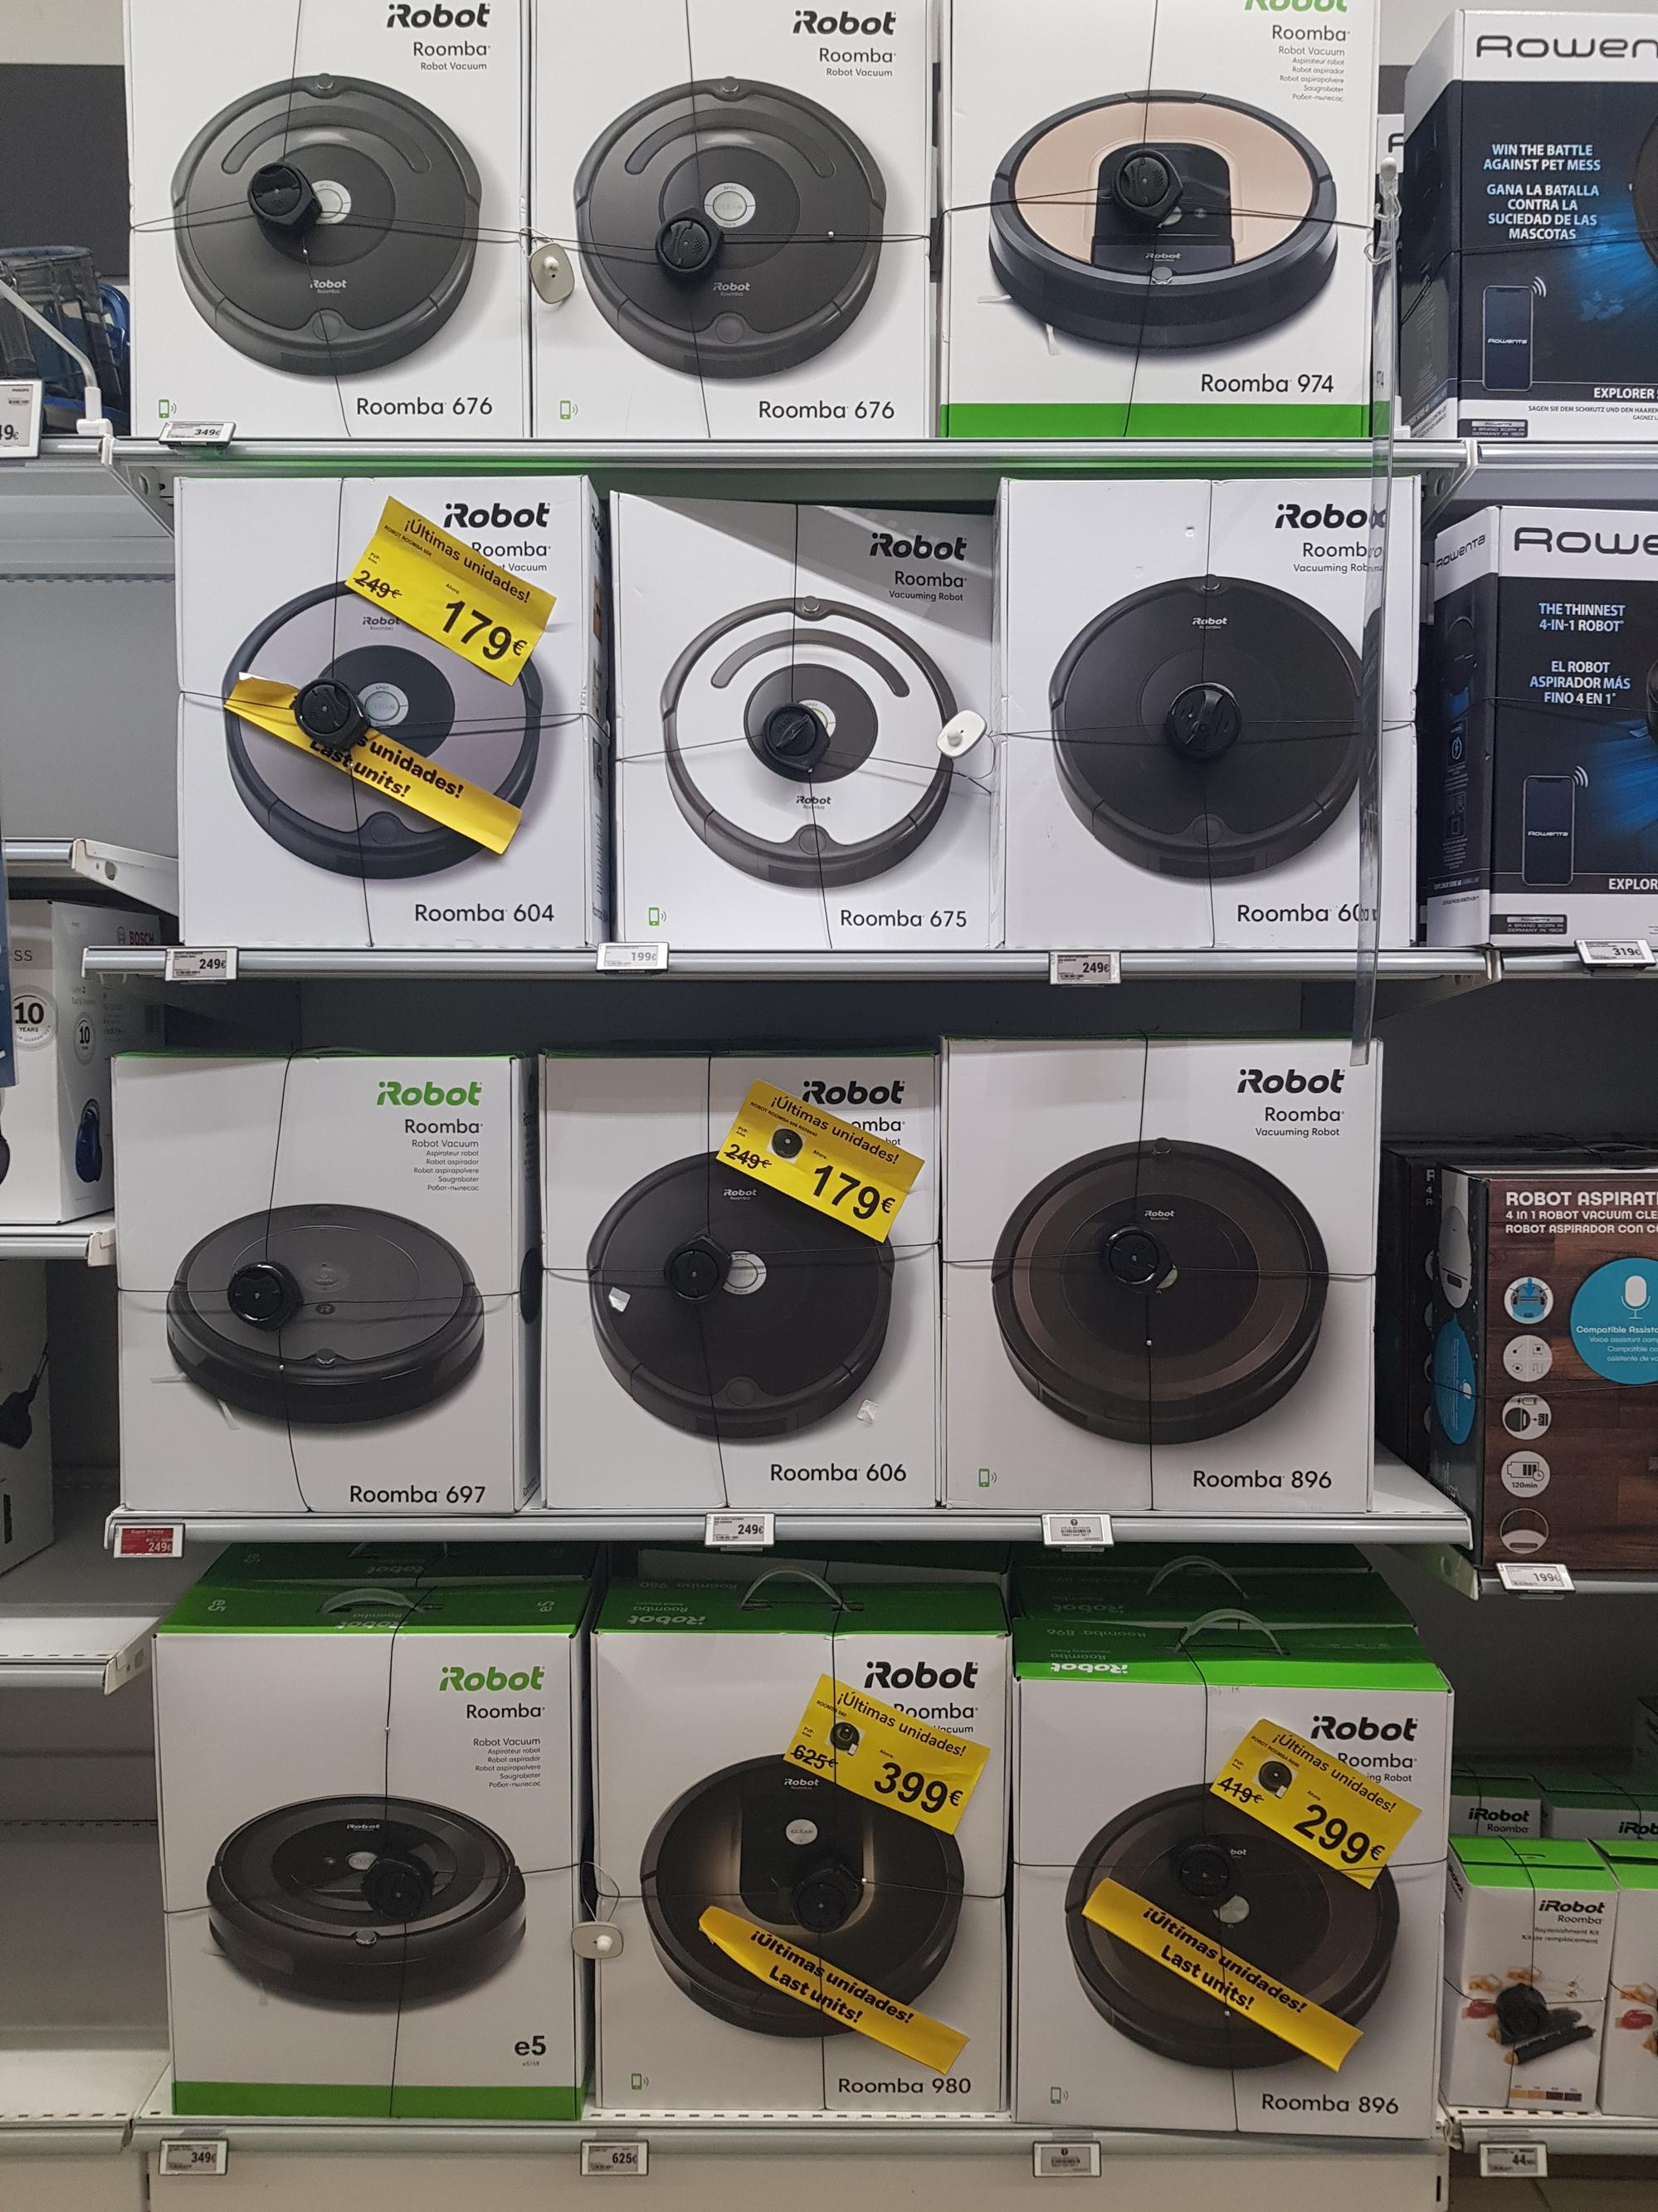 iRobot Roomba 604 y 606 a 179€, 896 a 299€, 980 a 399€